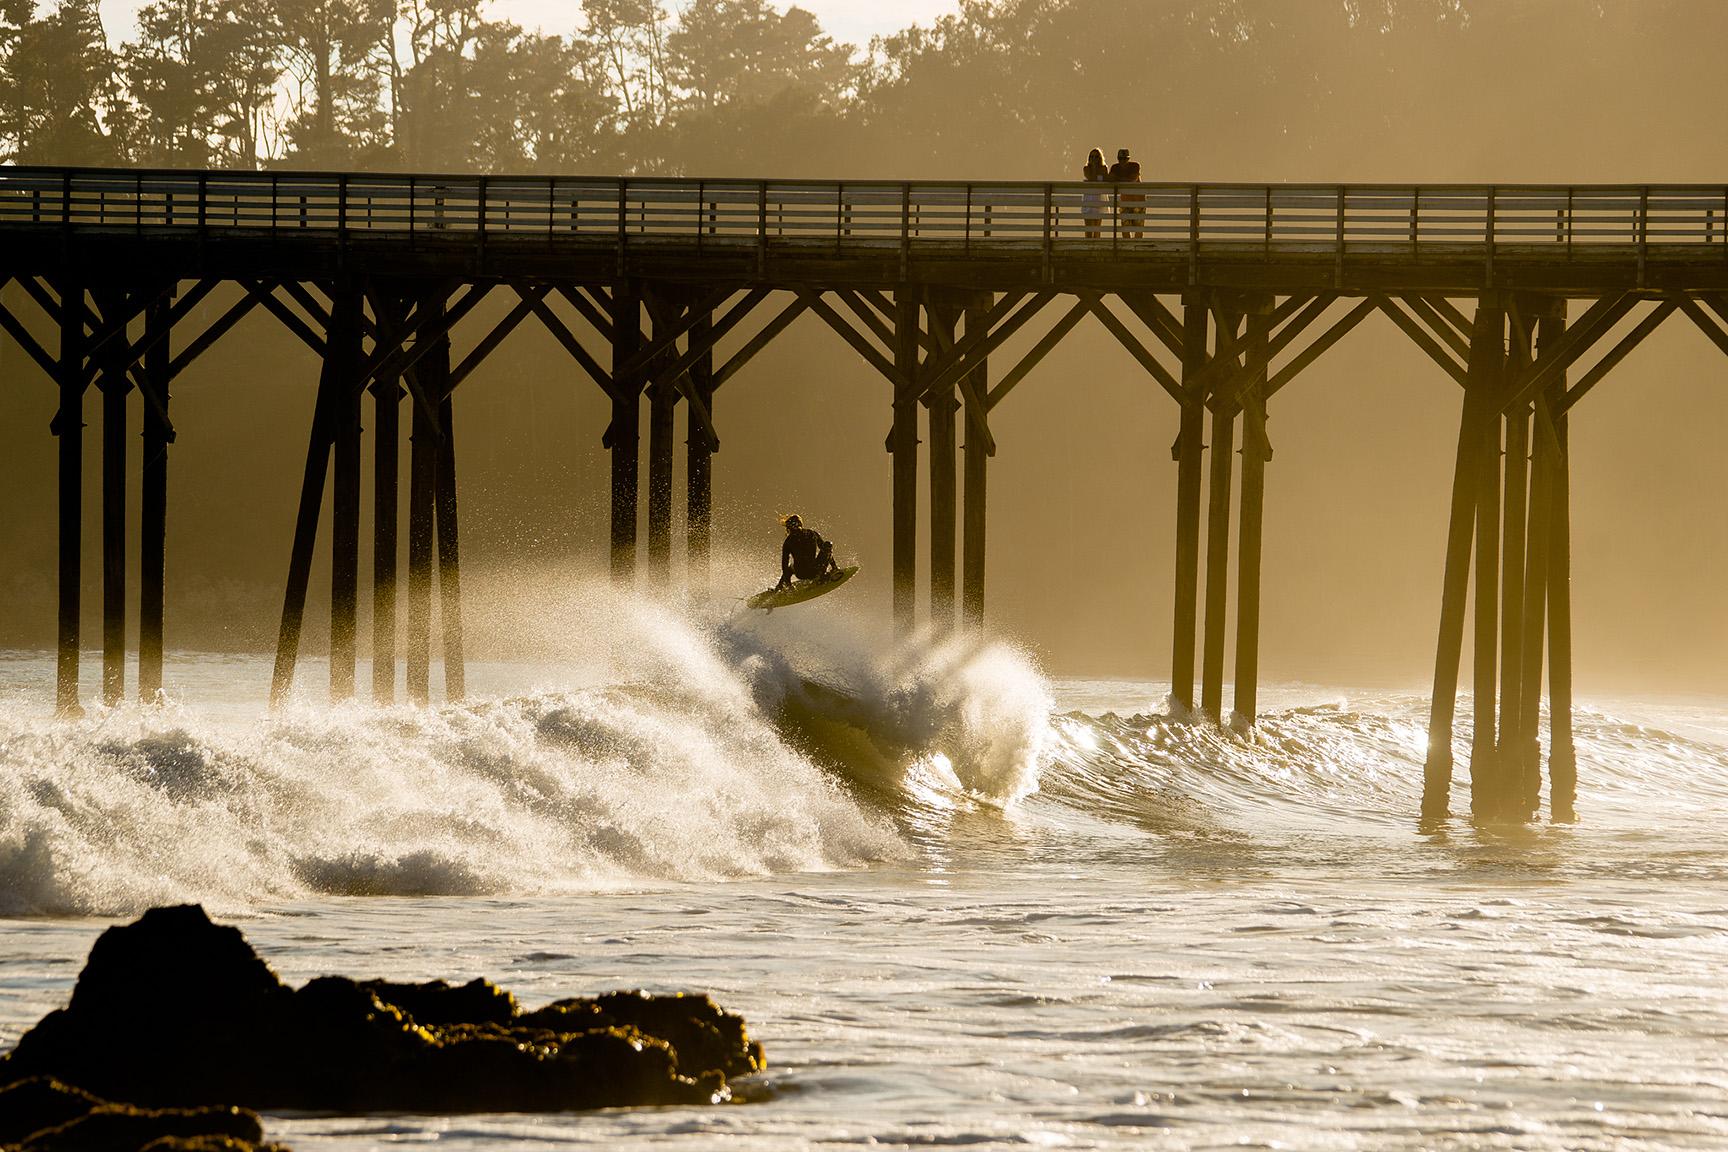 Nate Tyler, Central Coast, California